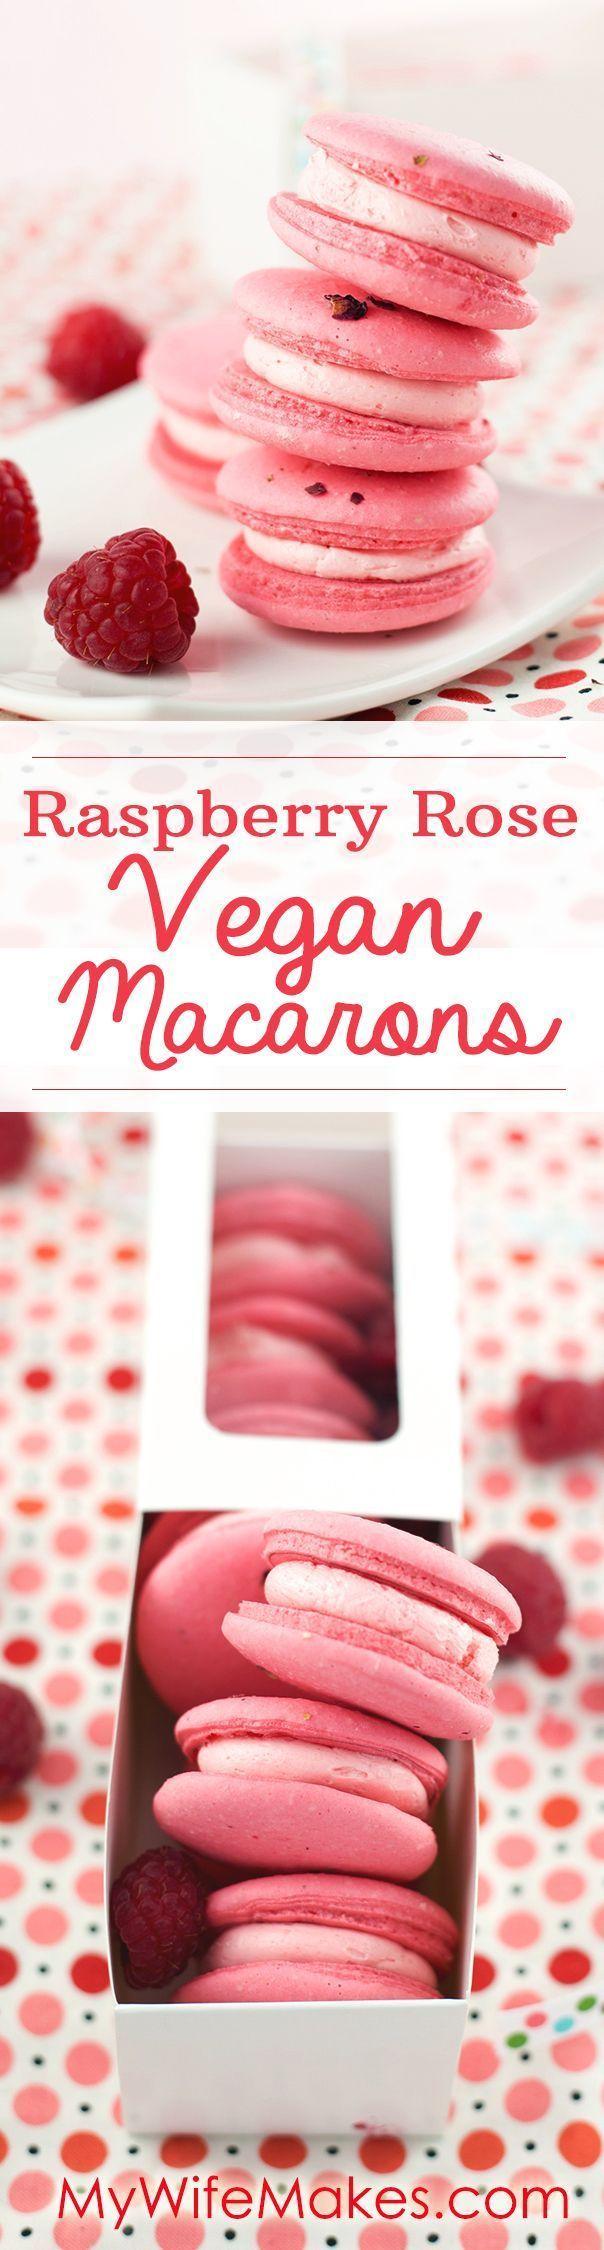 Delicious, fruity, and creamy Raspberry Rose Vegan Macarons made with Aquafaba. VEGAN GLUTEN FREE